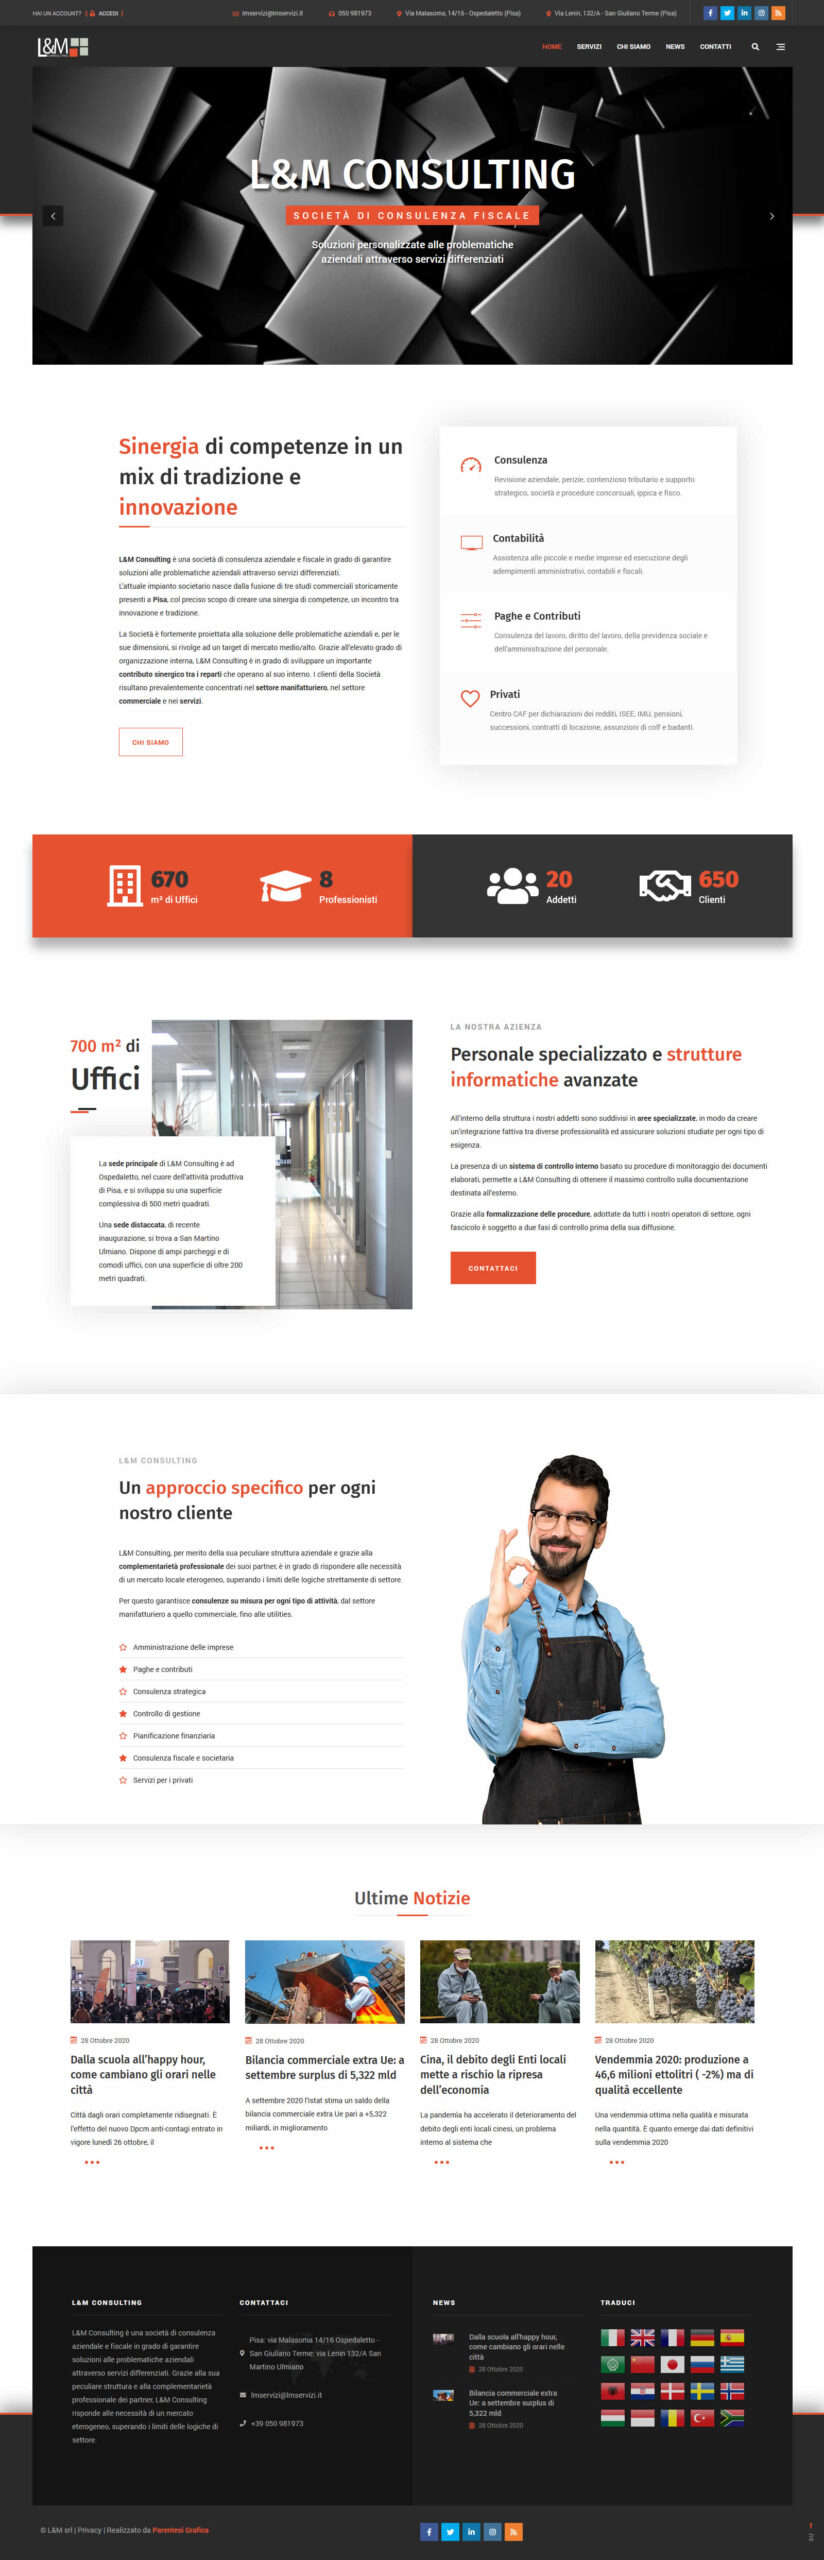 Sito web L&M Consulting - homepage